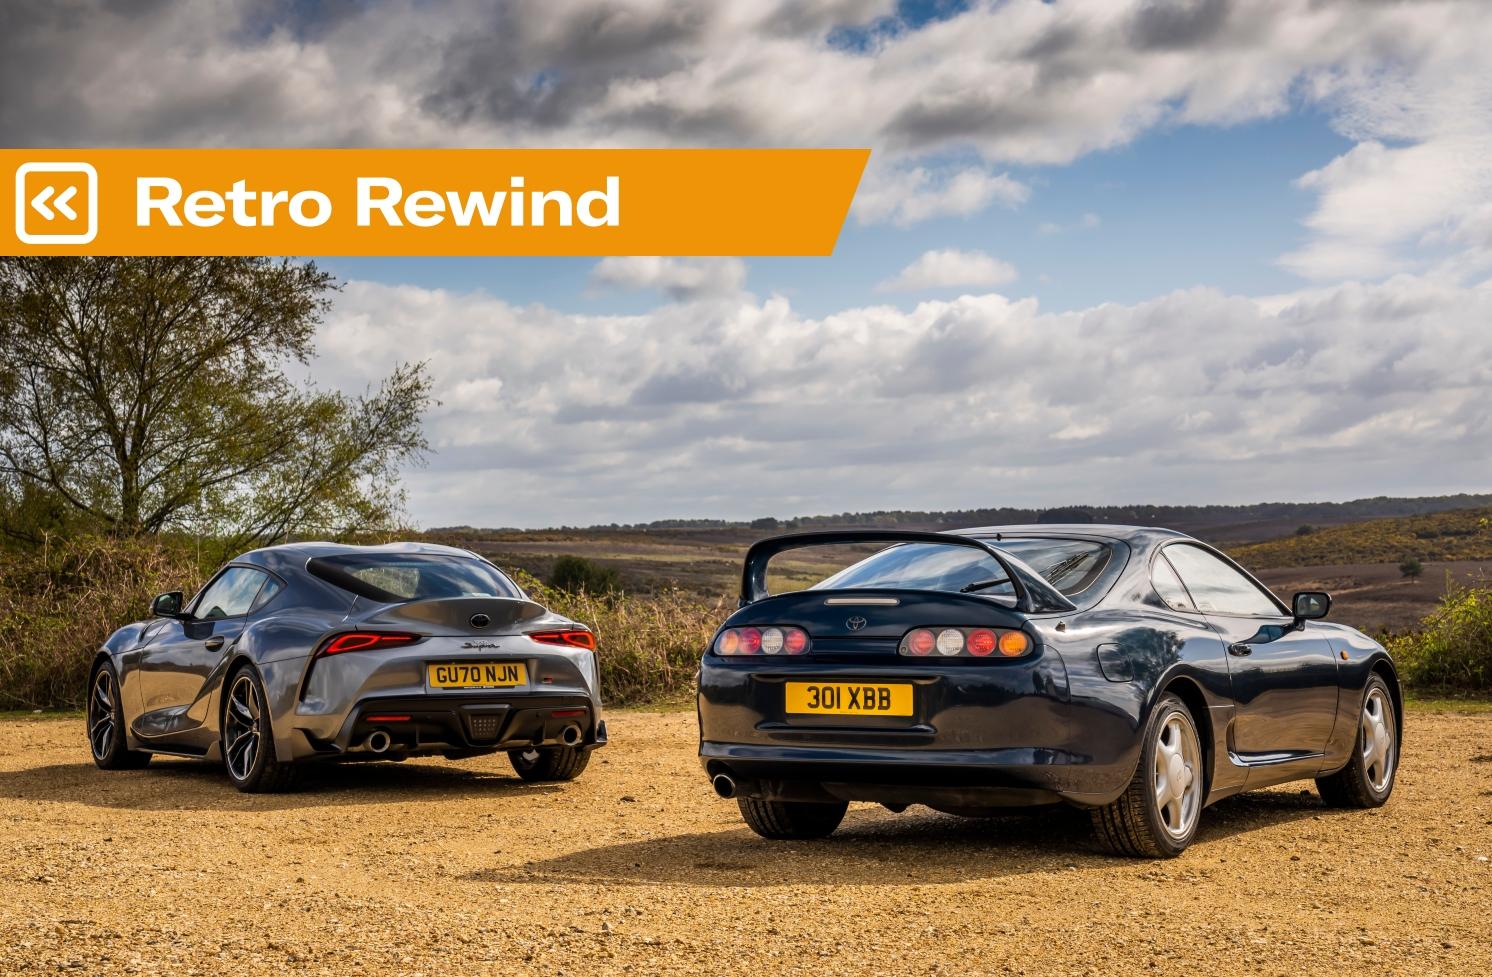 Retro Rewind: Mk4 Toyota Supra vs Mk5 Toyota Supra